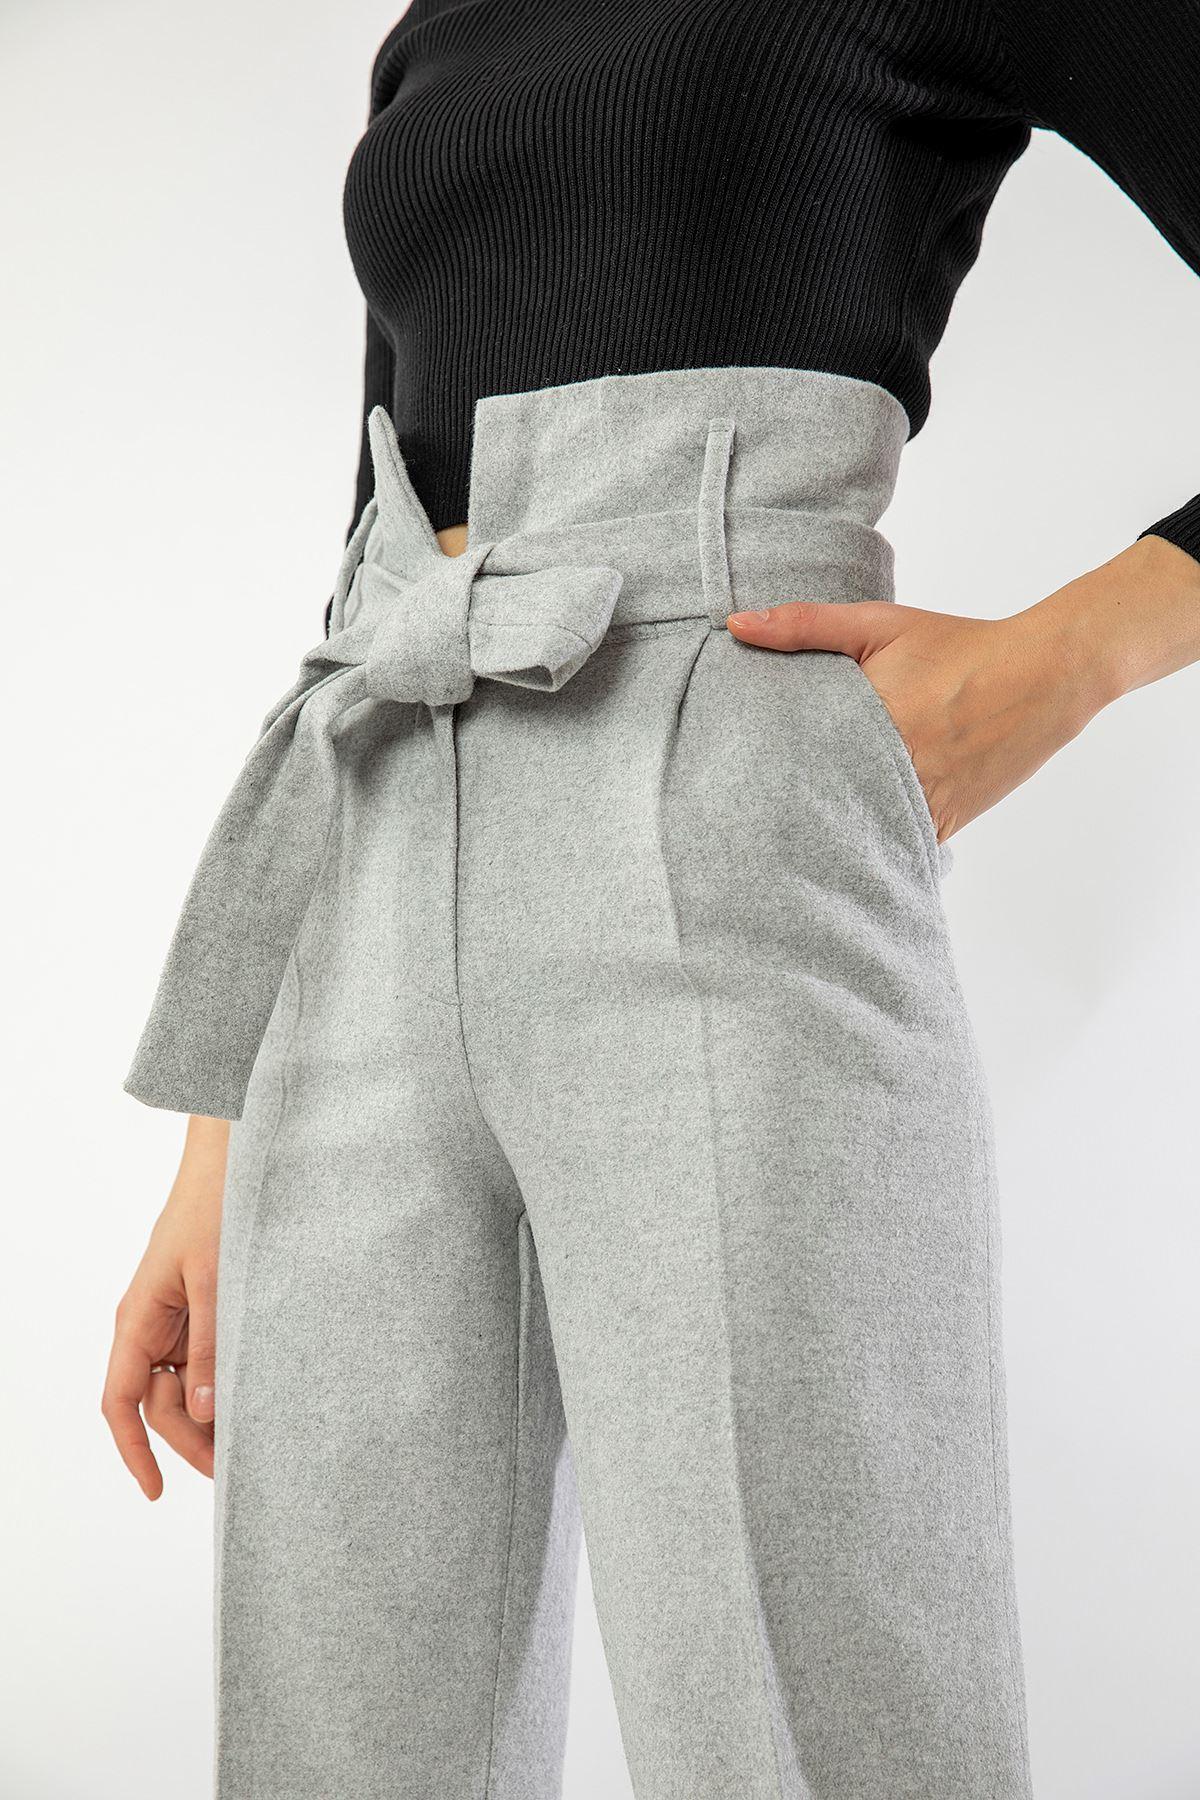 Yüksek Bel Kaşe Pantolon-Gri